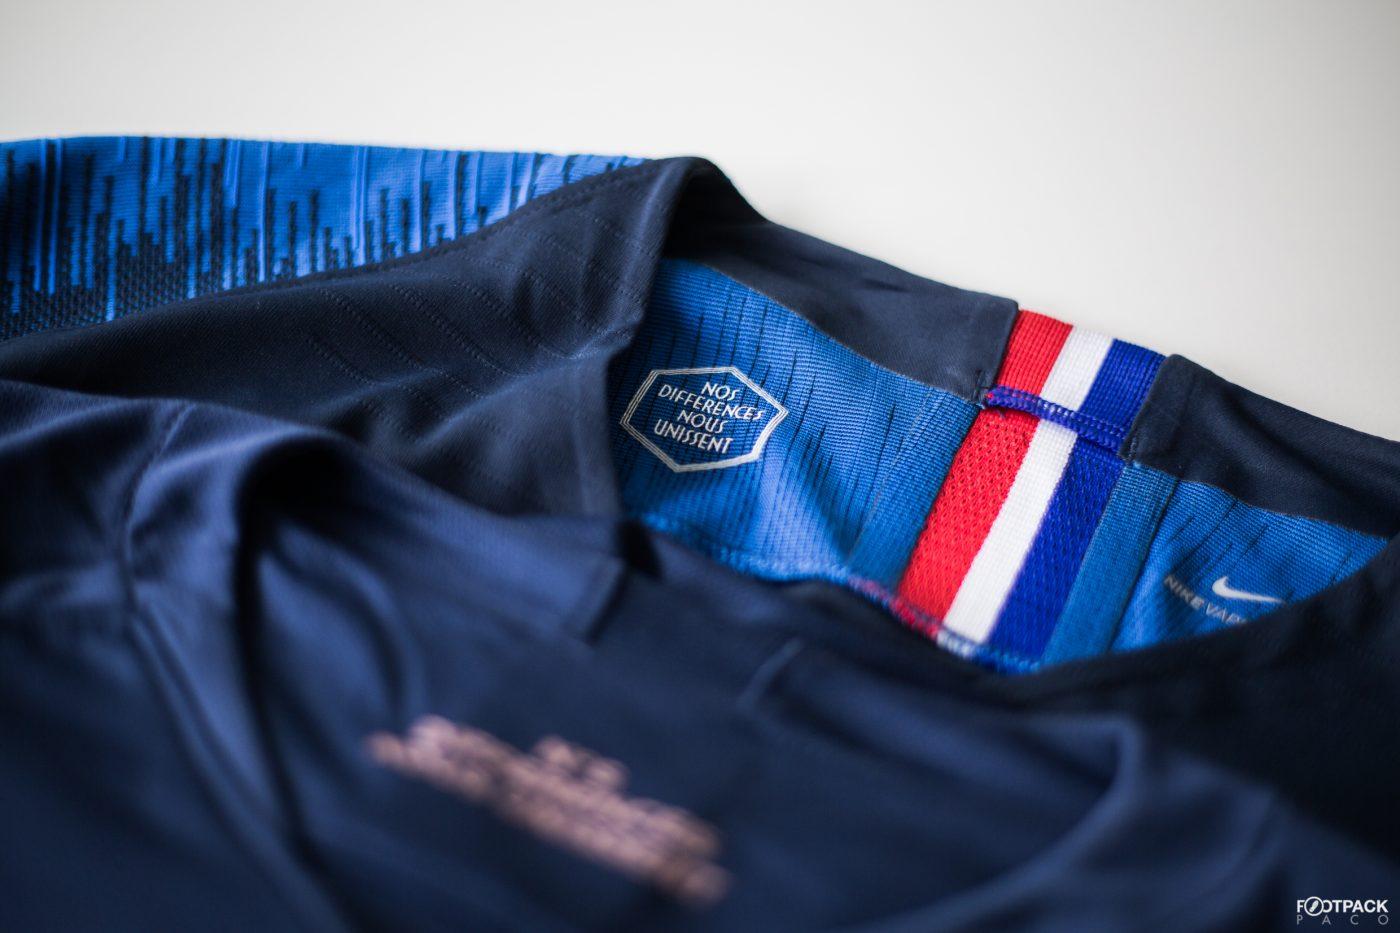 signification-nos-differences-nous-unissent-maillot-france-coupe-du-monde-feminine-nike-11